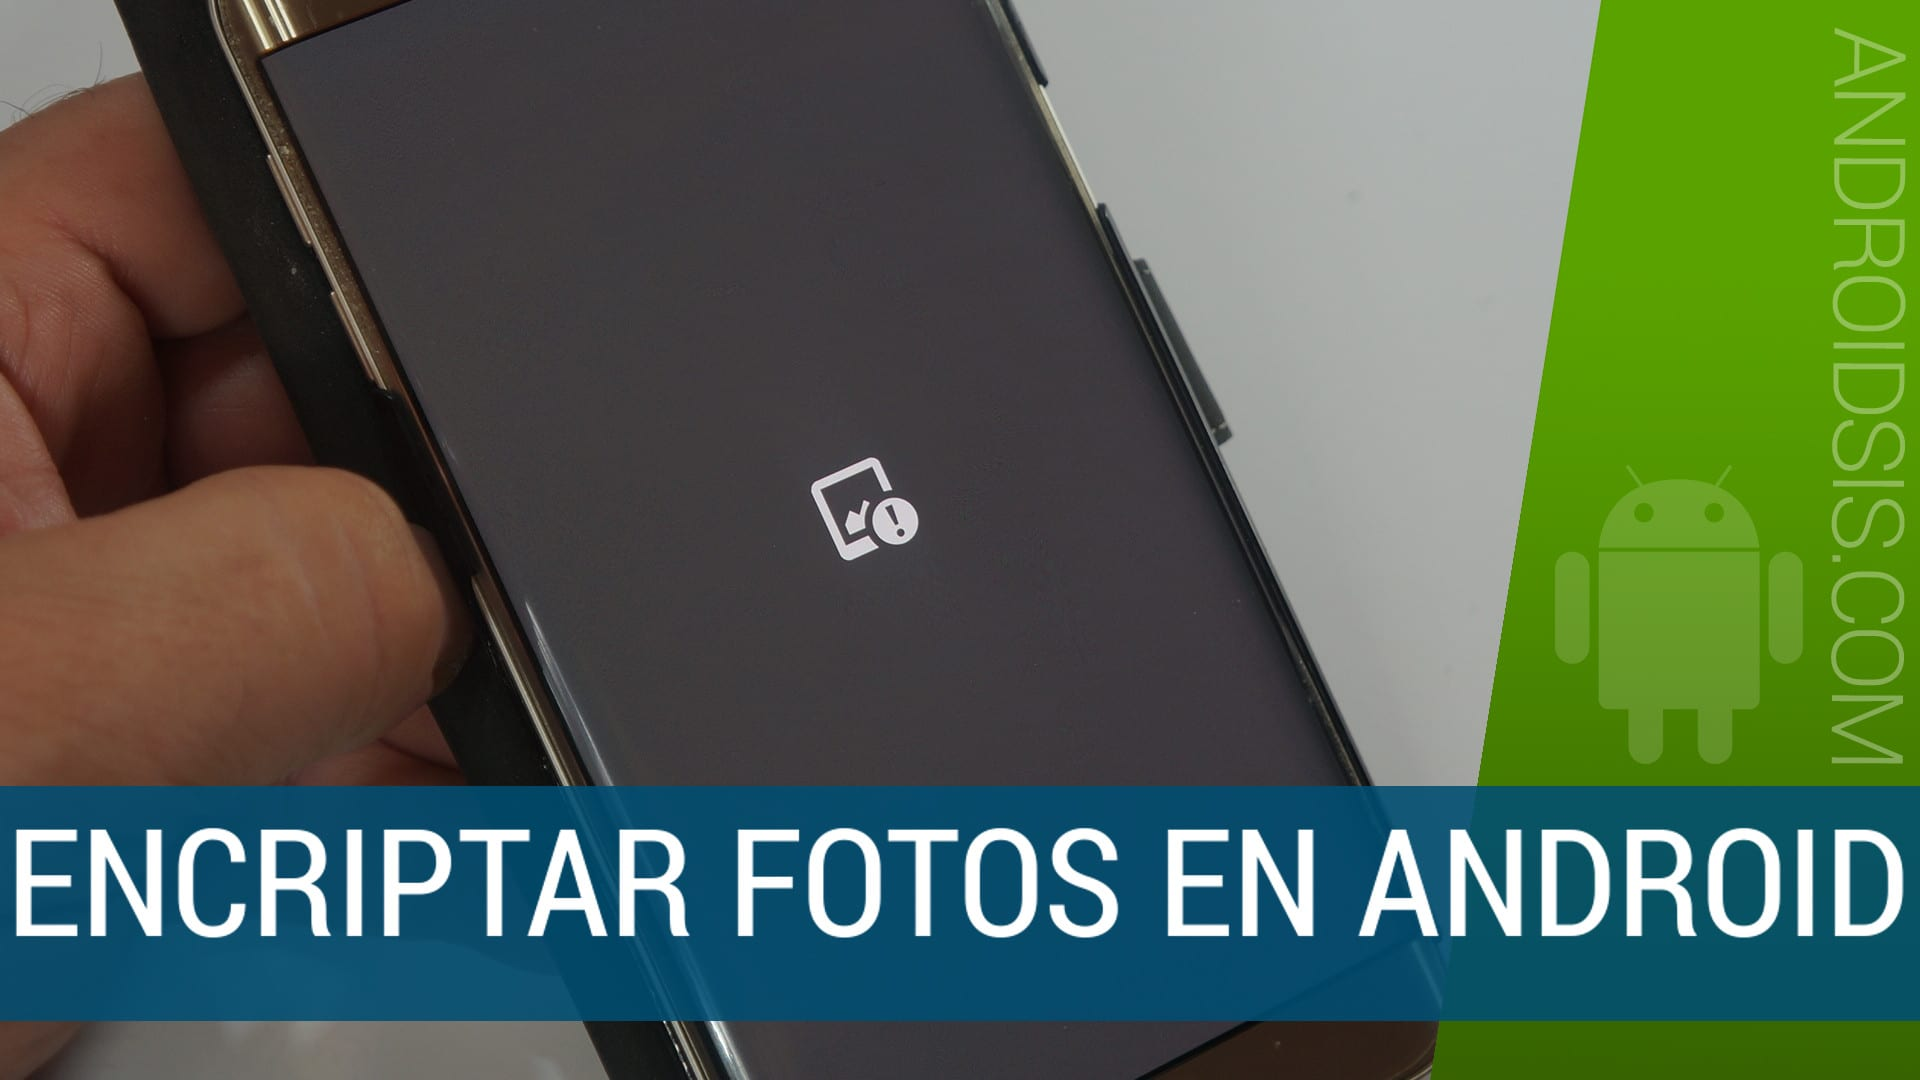 Encriptar fotos en Android